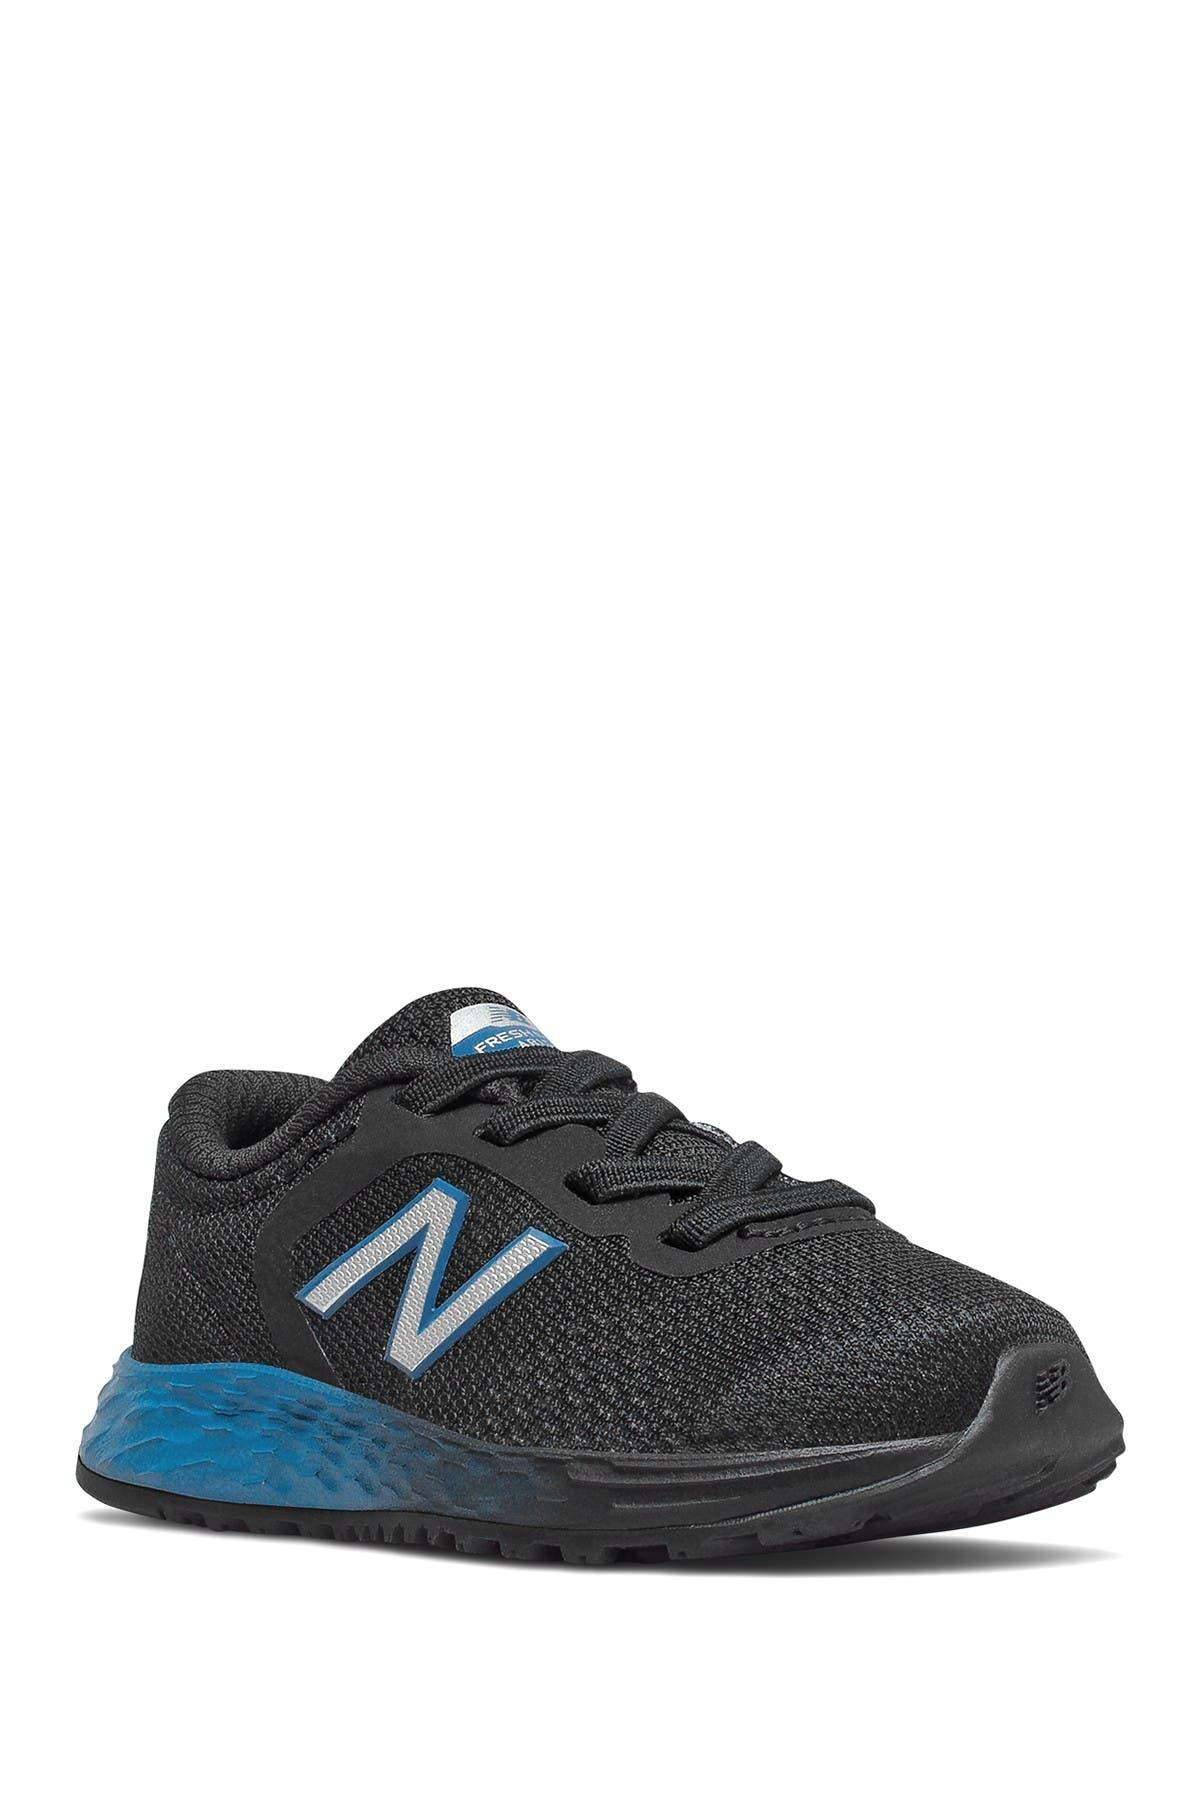 Image of New Balance Arishi V2 Running Shoe